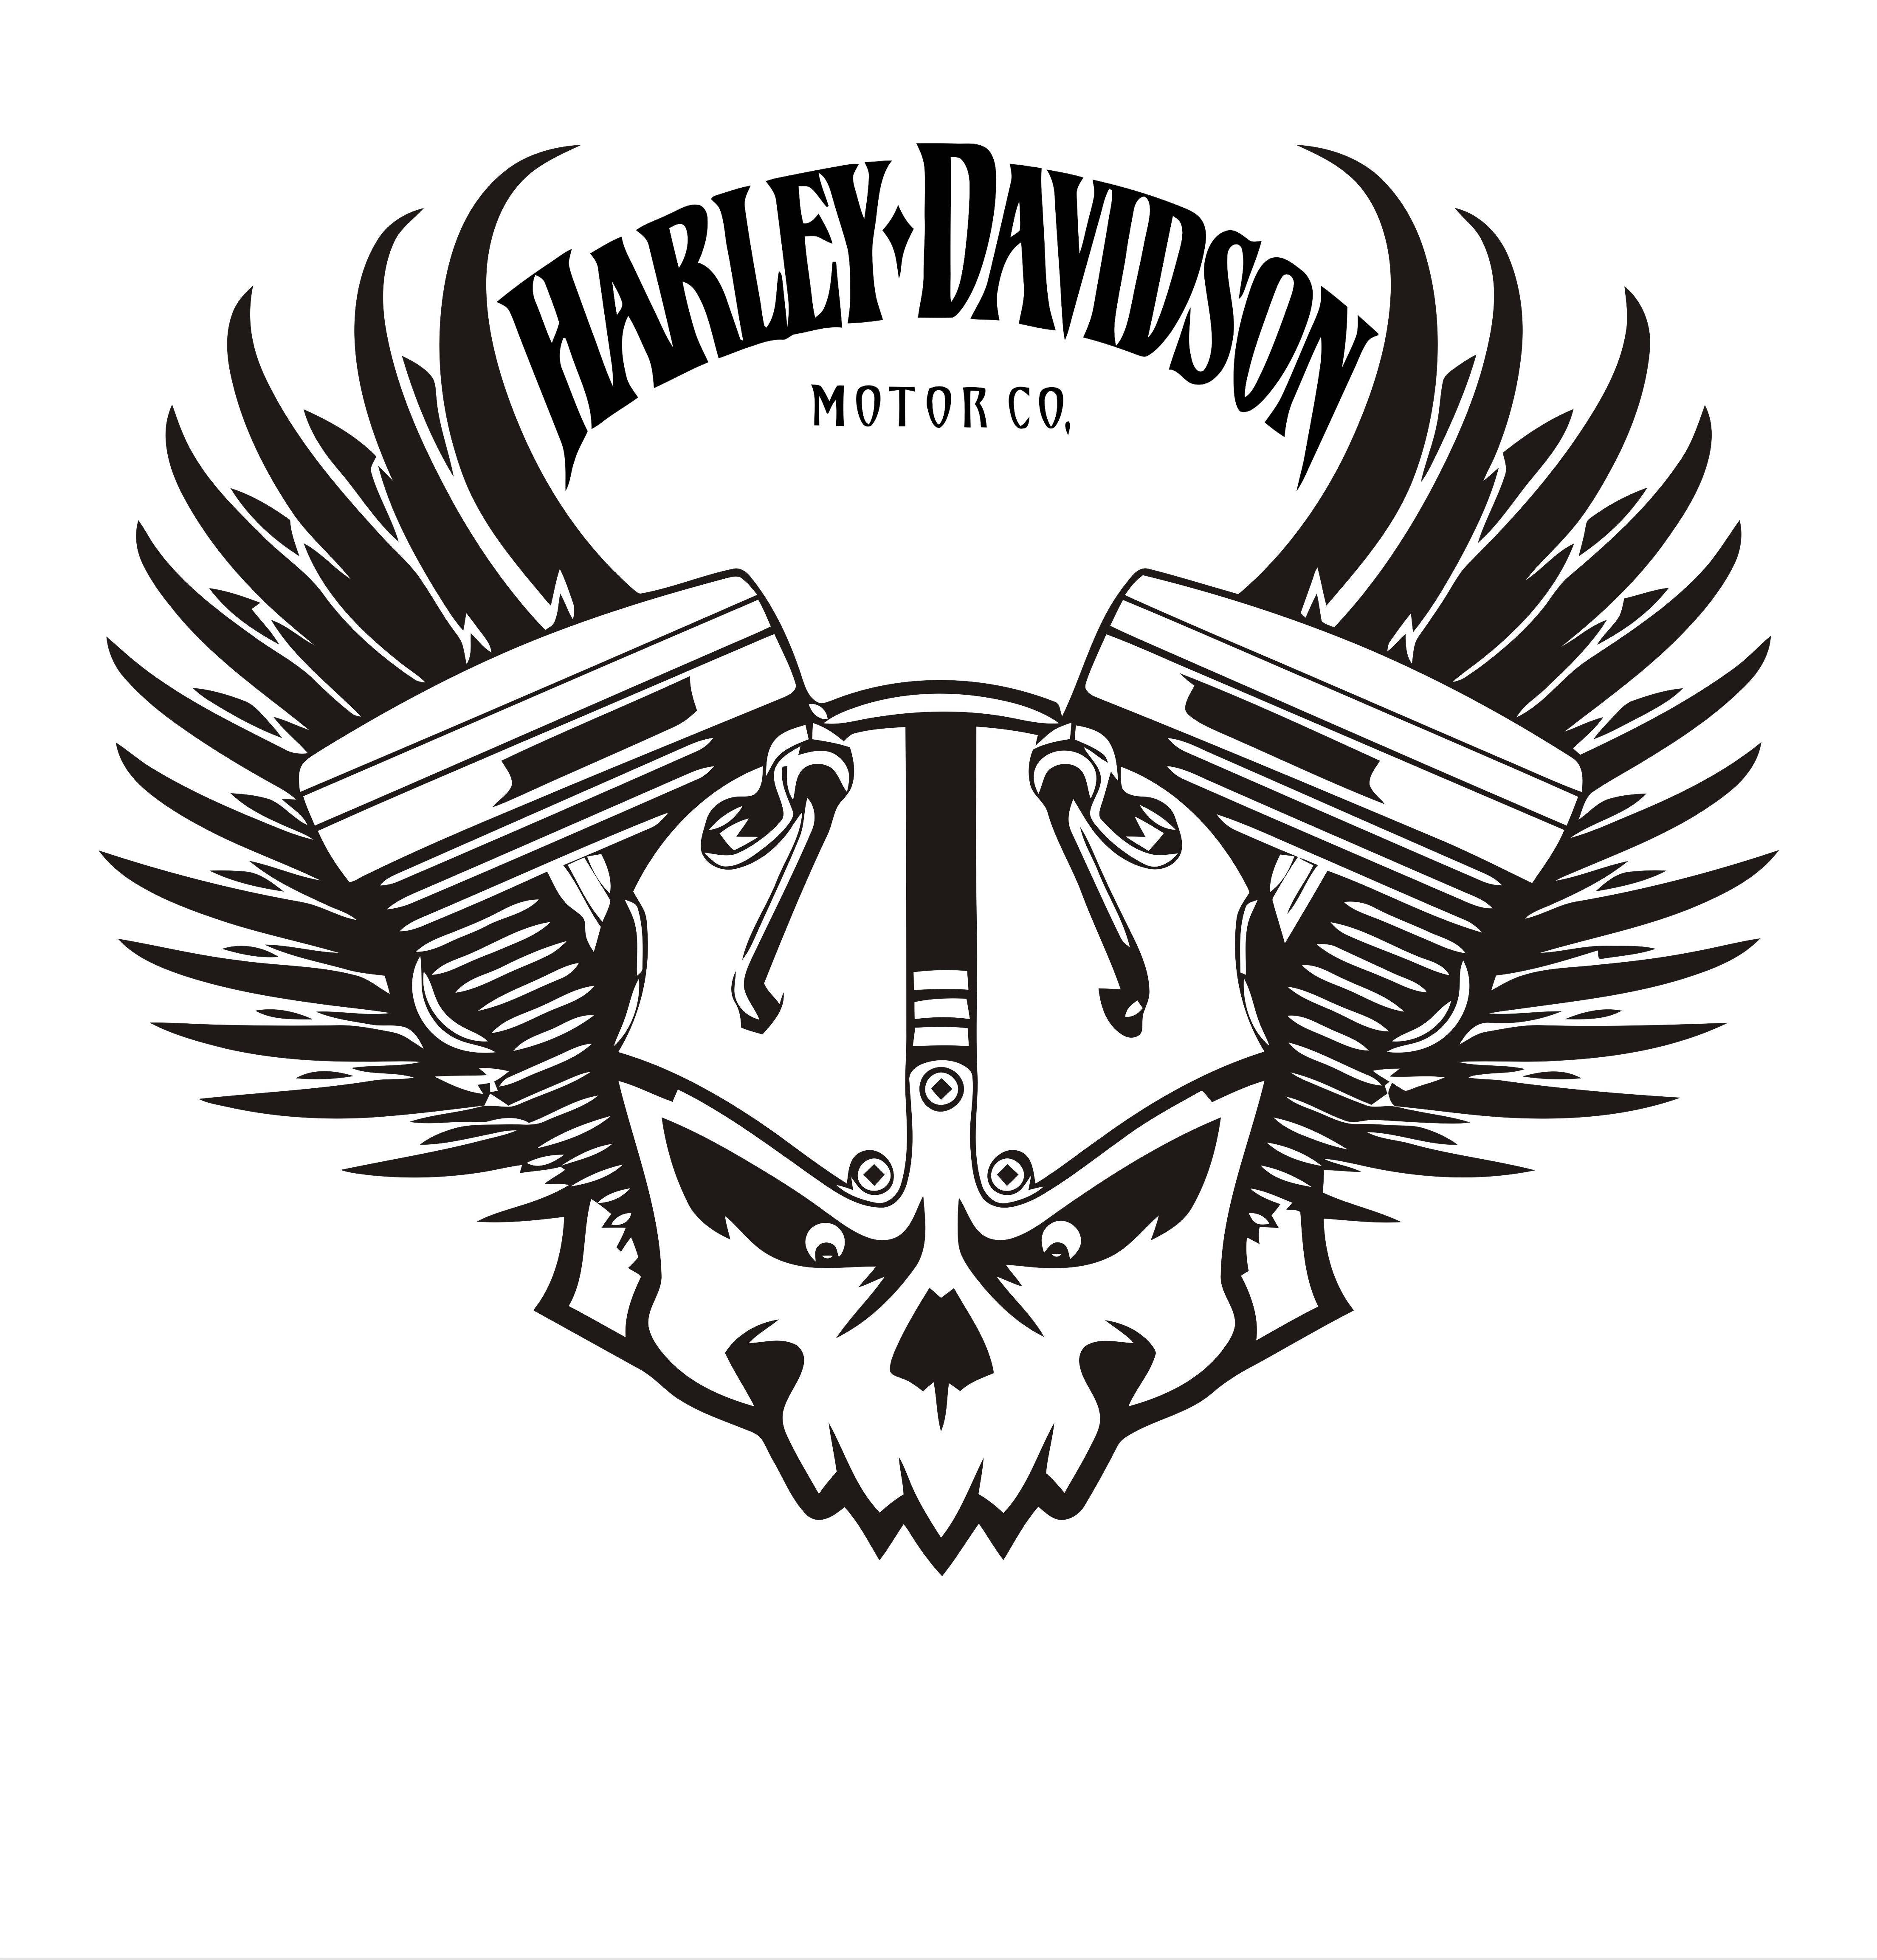 Harley davidson decals harley davidson tattoos harley davidson parts harley davidson motorcycles